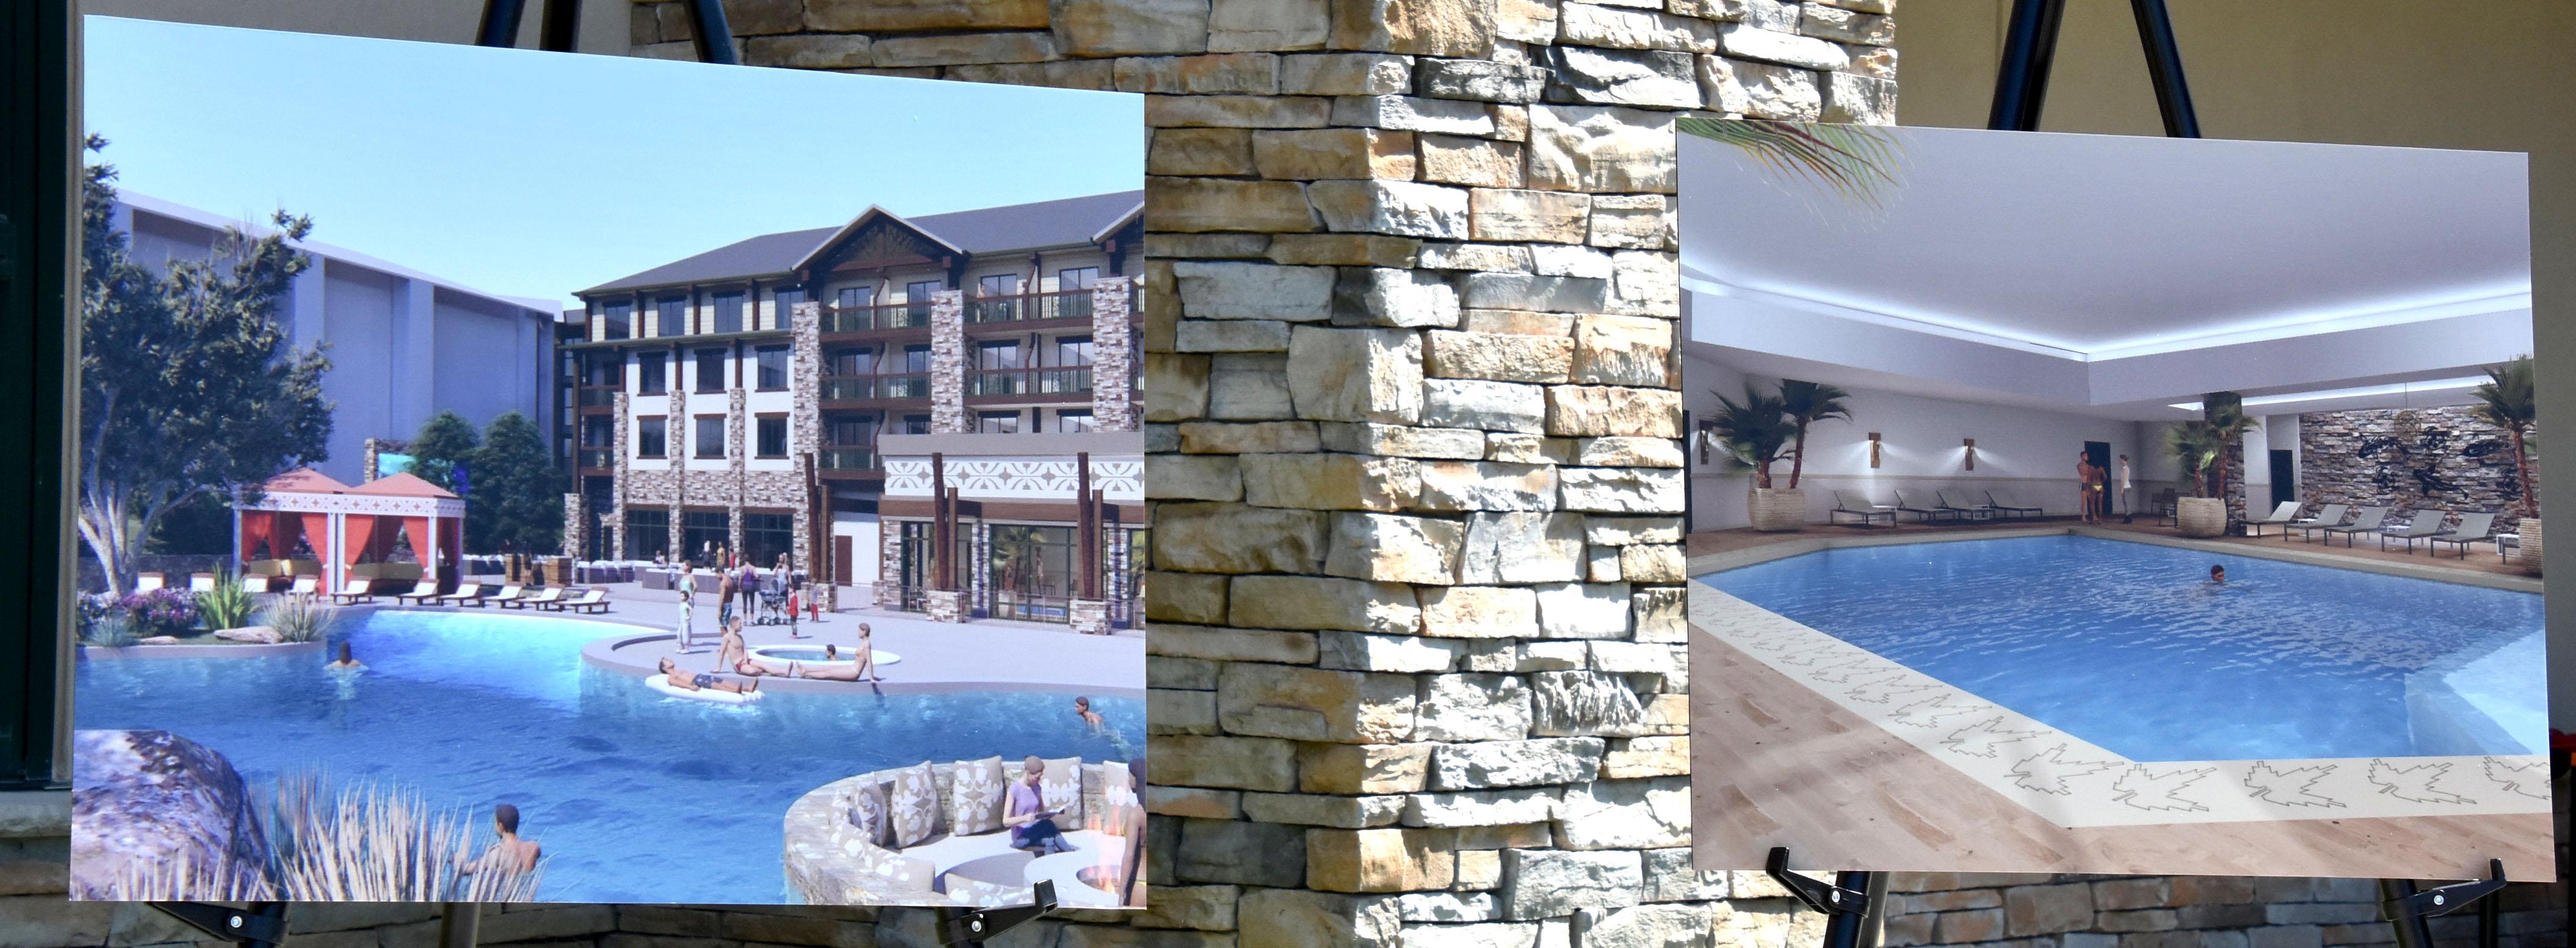 Prairie band casino remodel renovation expansion puyallup casino resort